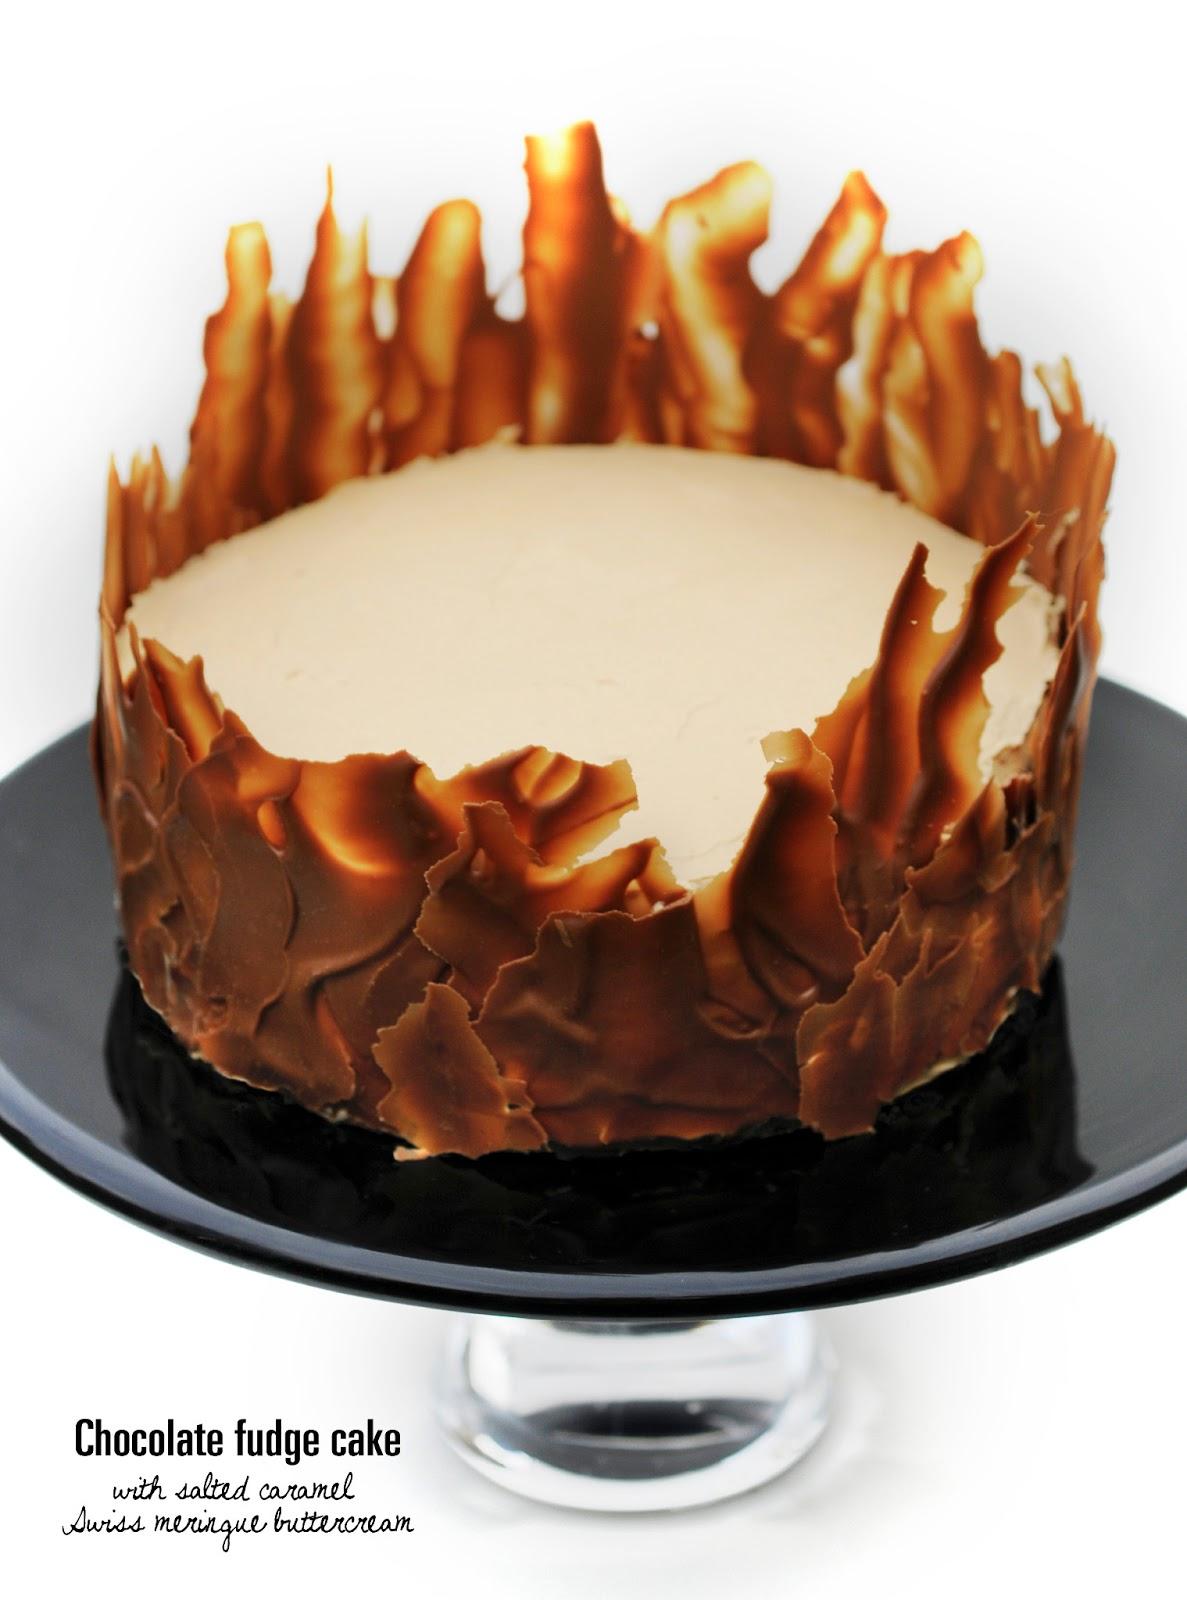 ... with salted caramel Swiss meringue buttercream | supergolden bakes